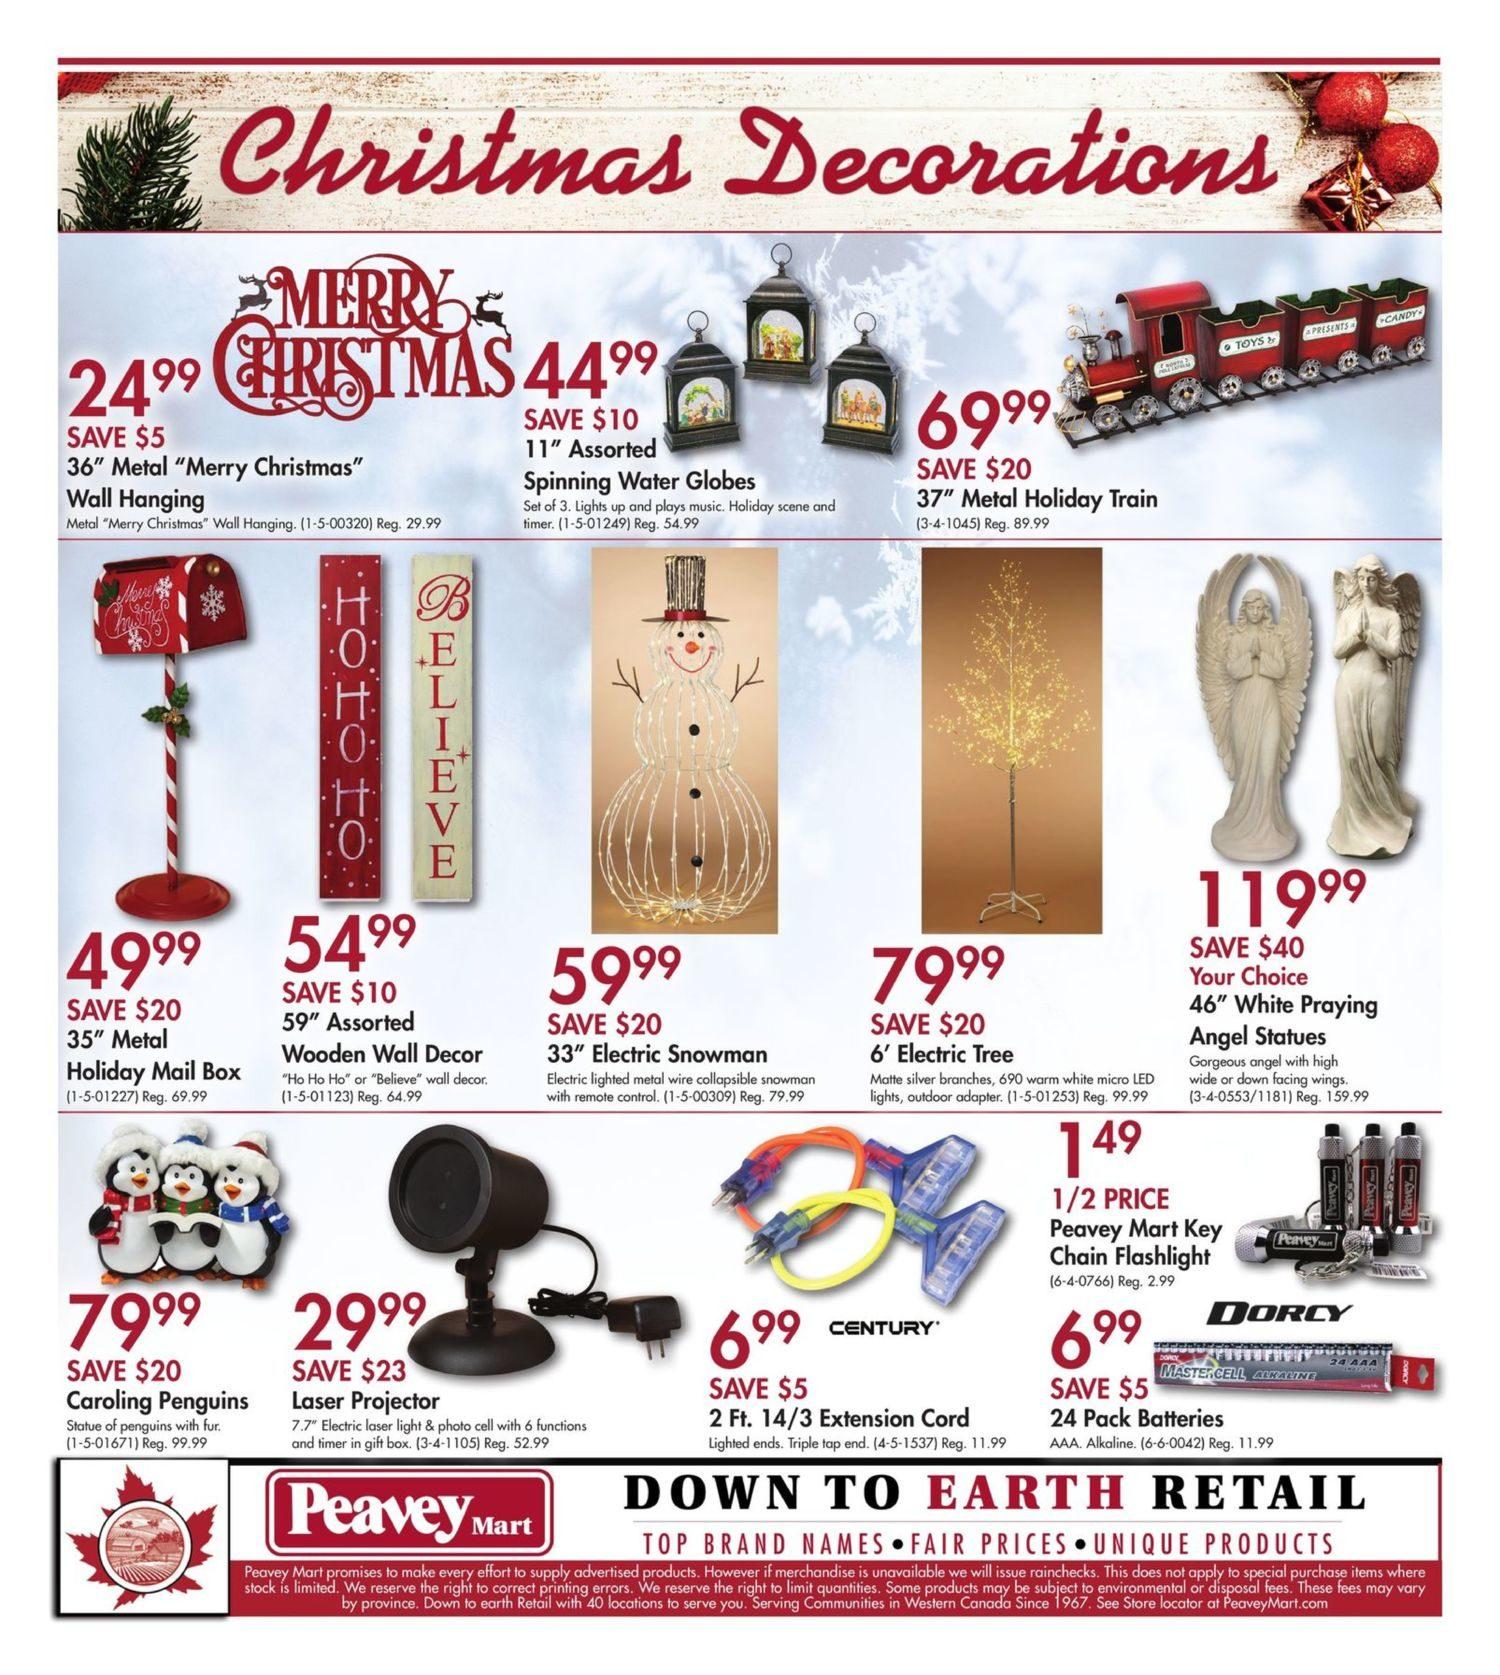 Peaveymart Weekly Flyer Warm Up To Savings Nov 8 17 Redflagdeals Com